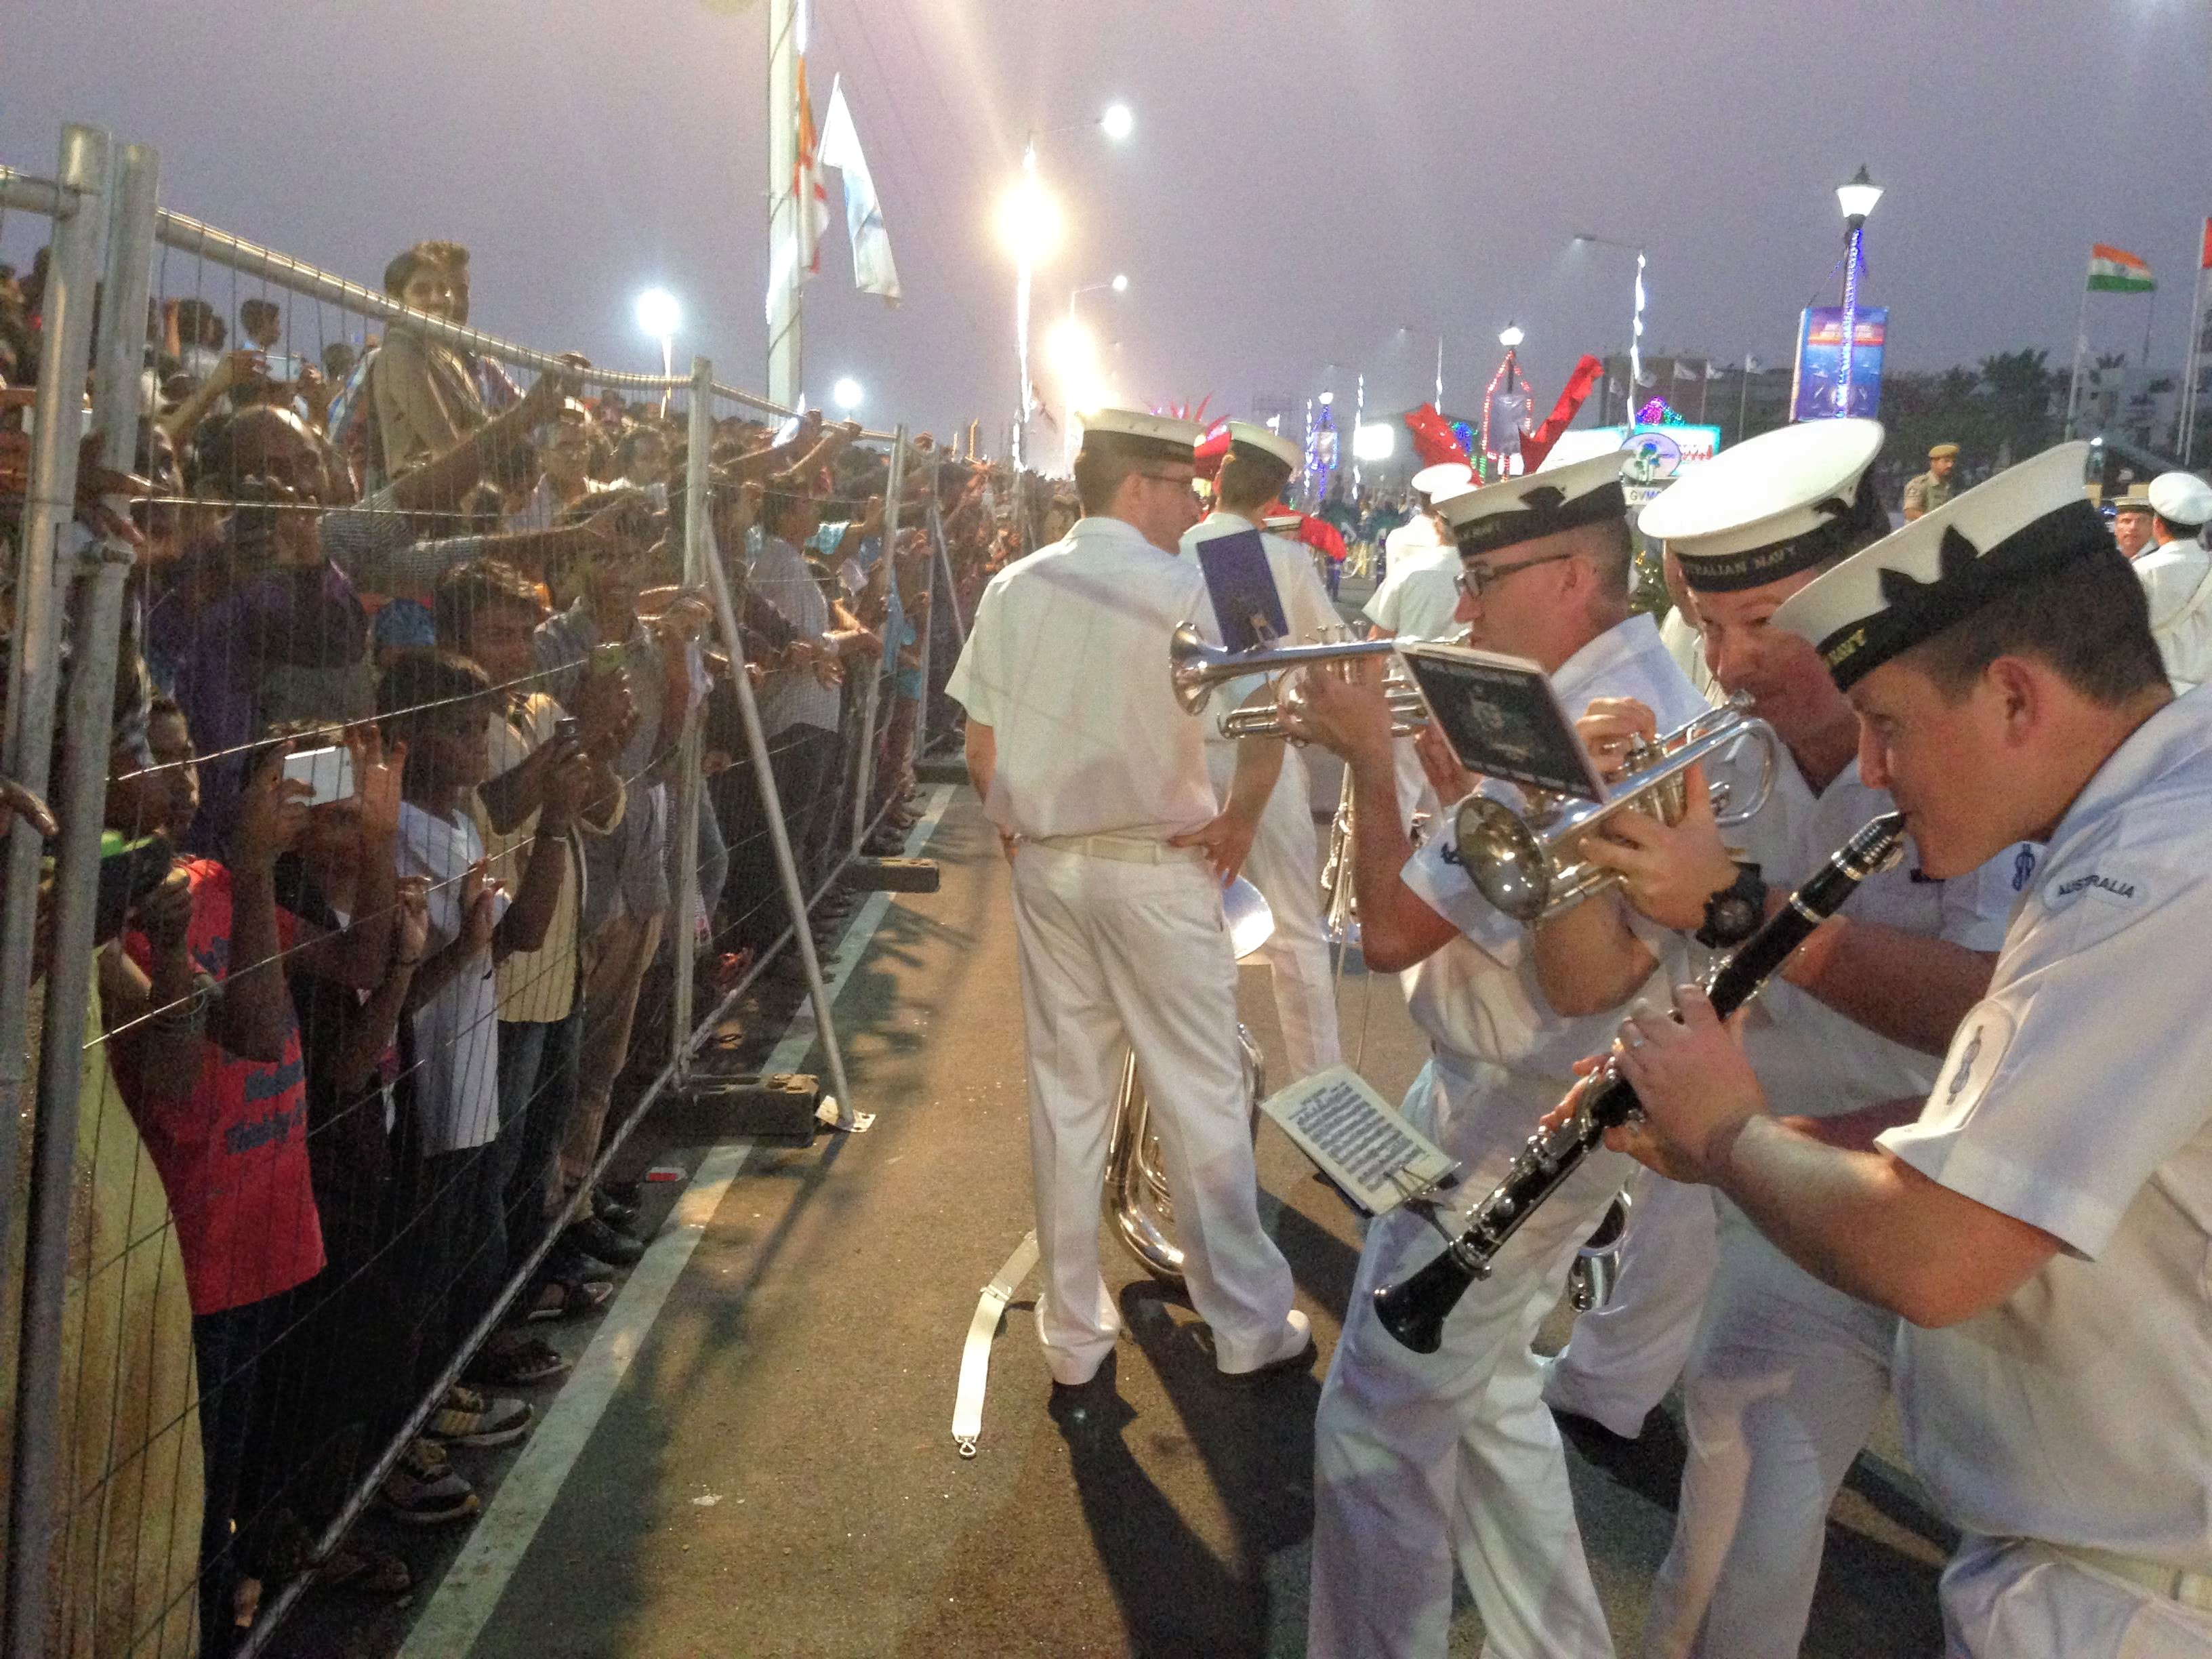 Royal Australian Navy Band members entertaining Prime Minister Modi along with 3 million spectators